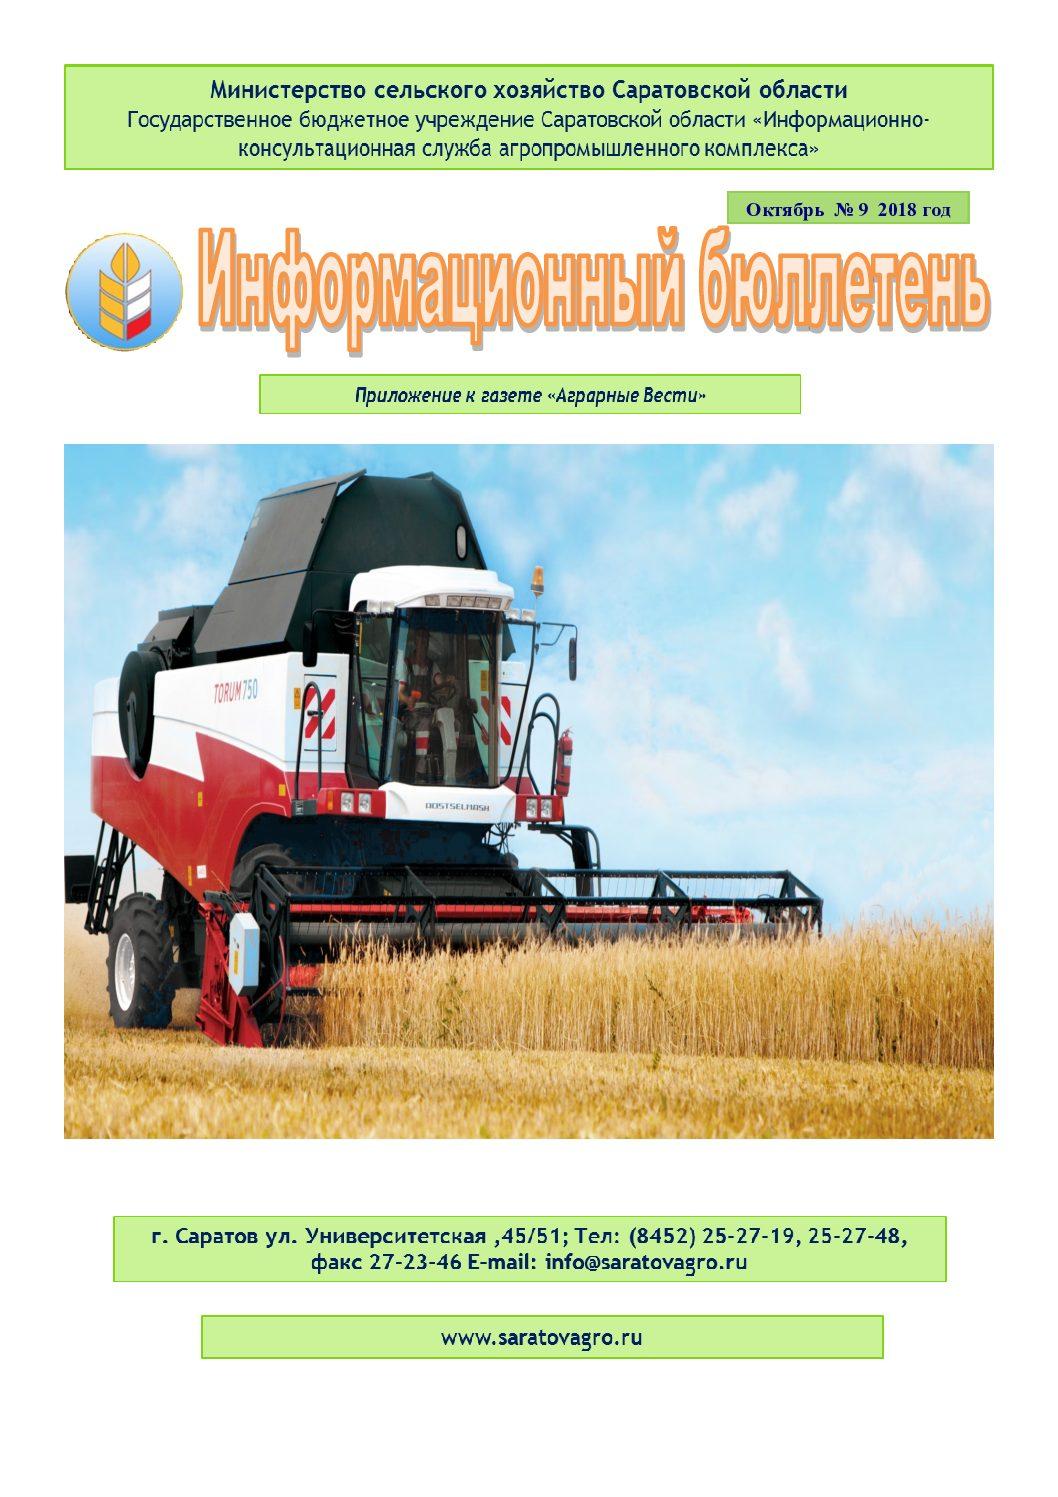 https://saratovagro.ru/wp-content/uploads/2020/08/9.2018-1-pdf.jpg